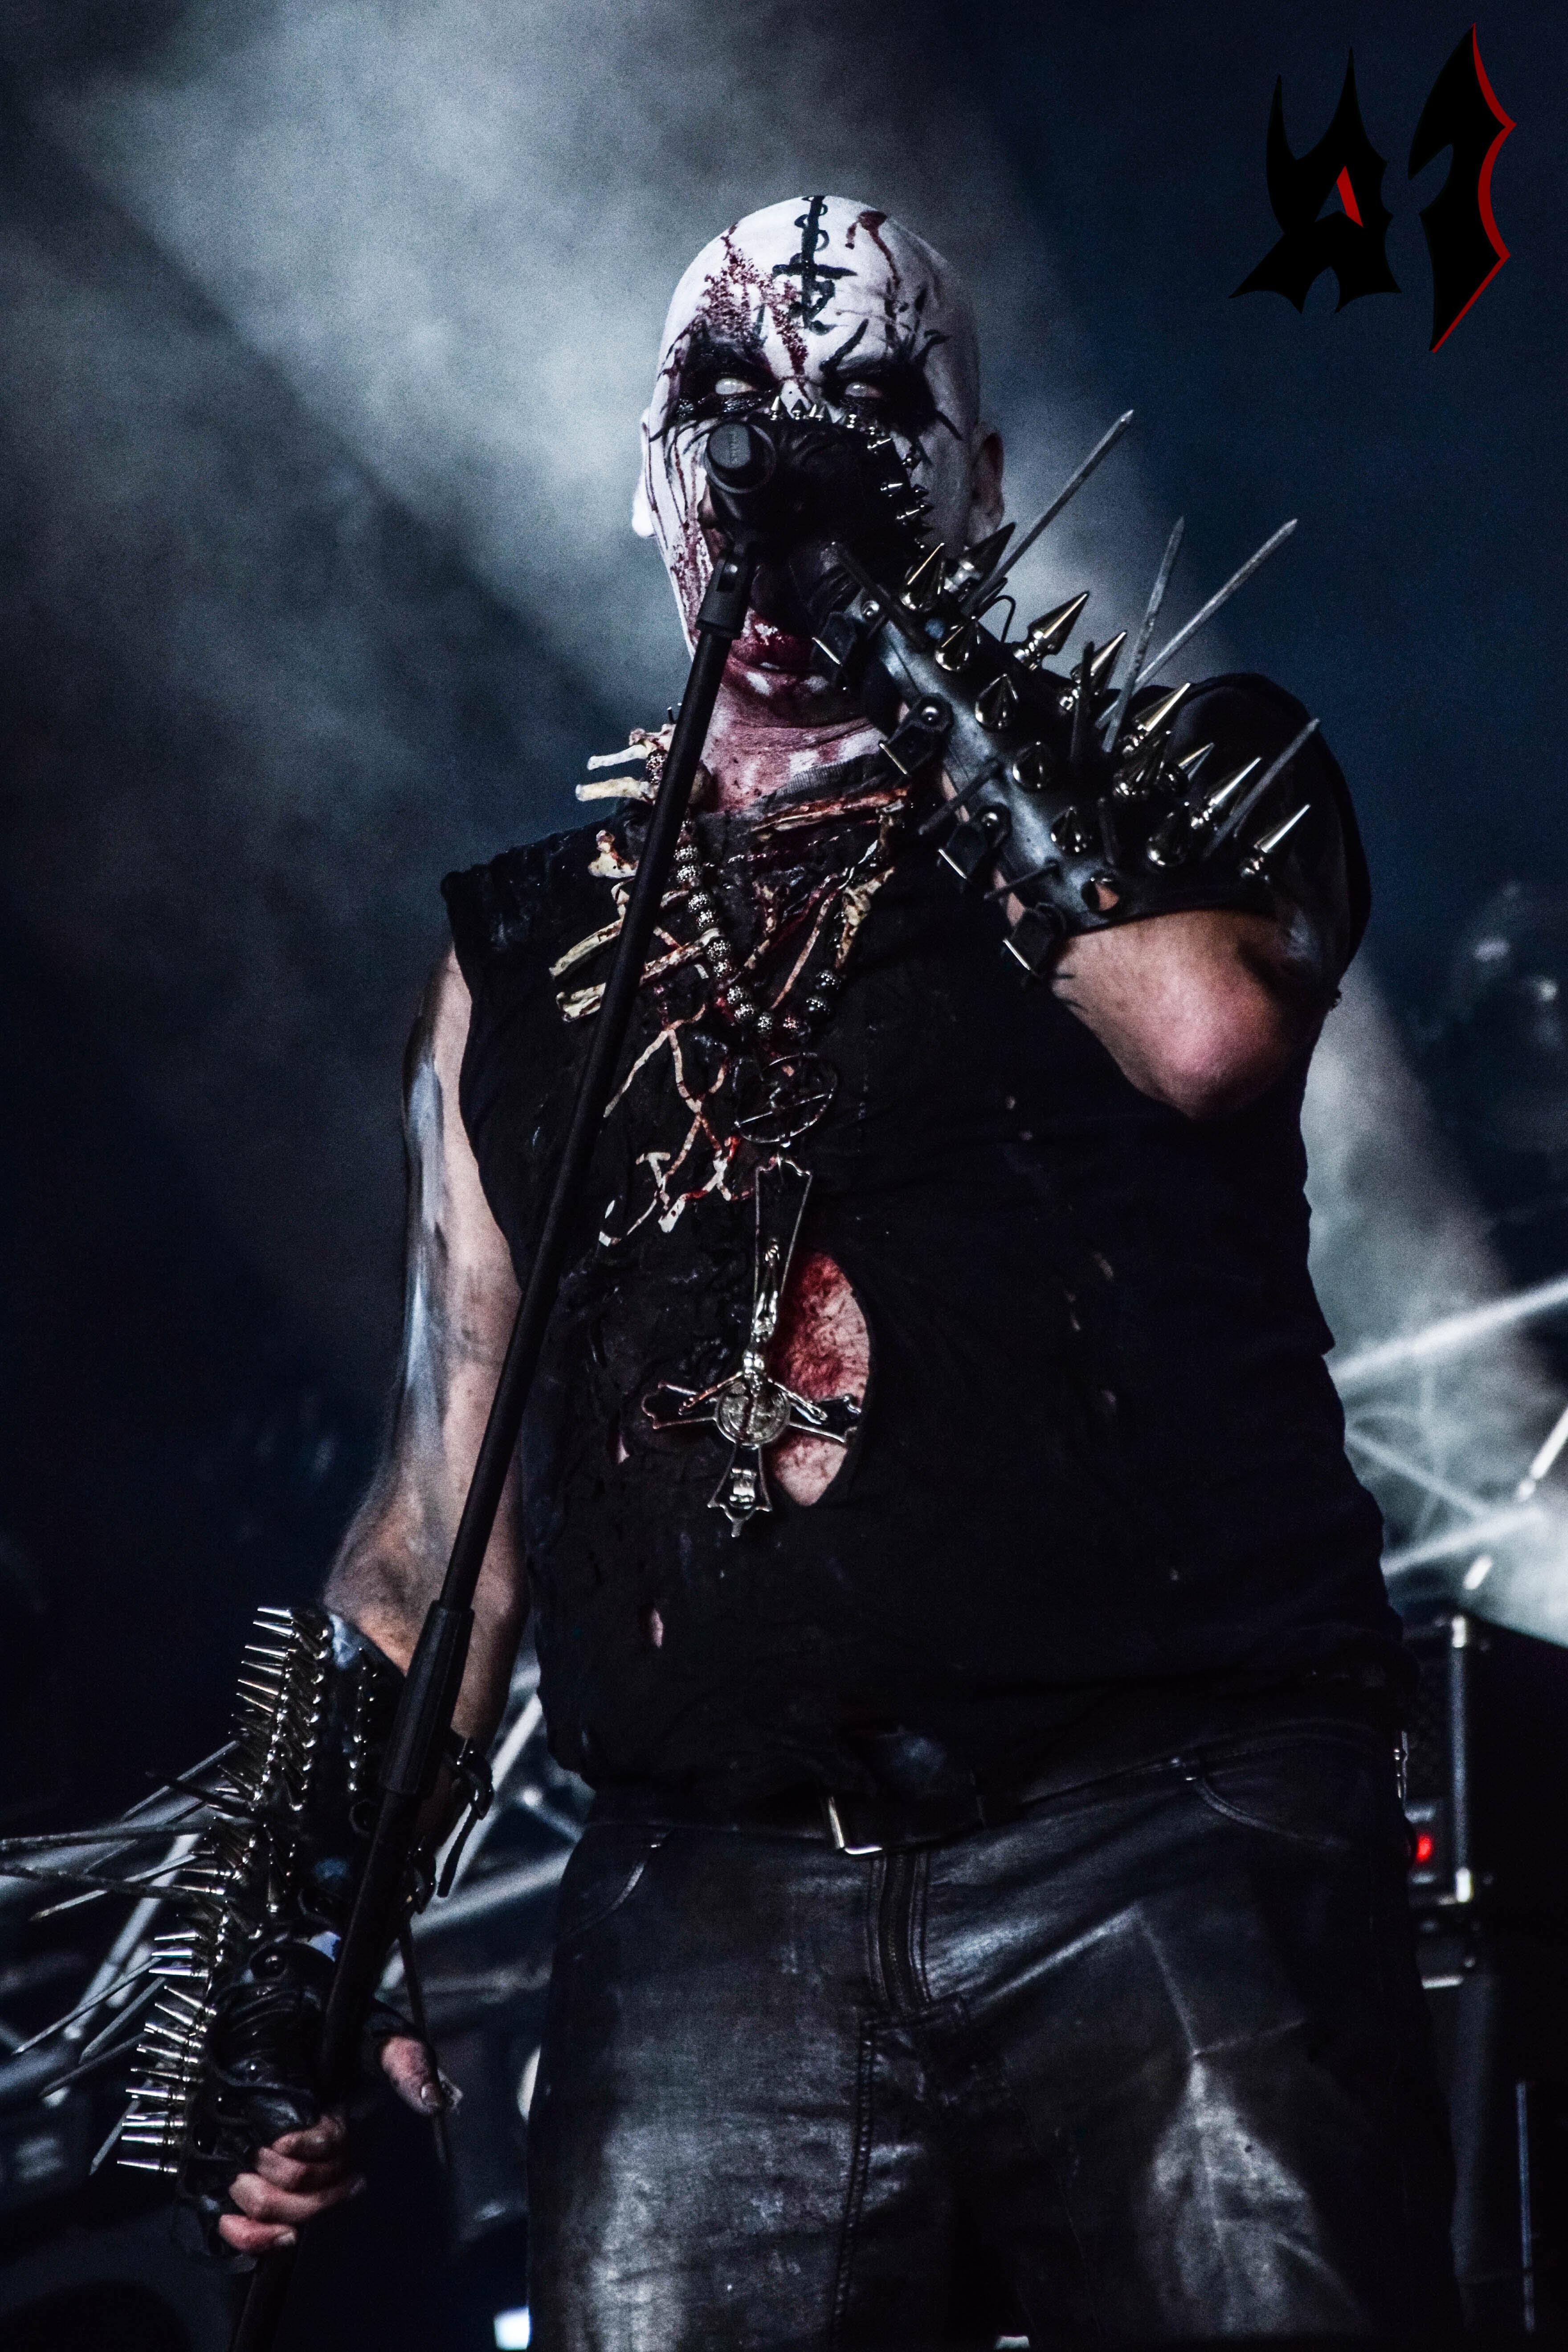 Hellfest - Day 1 - Nordjevel 2